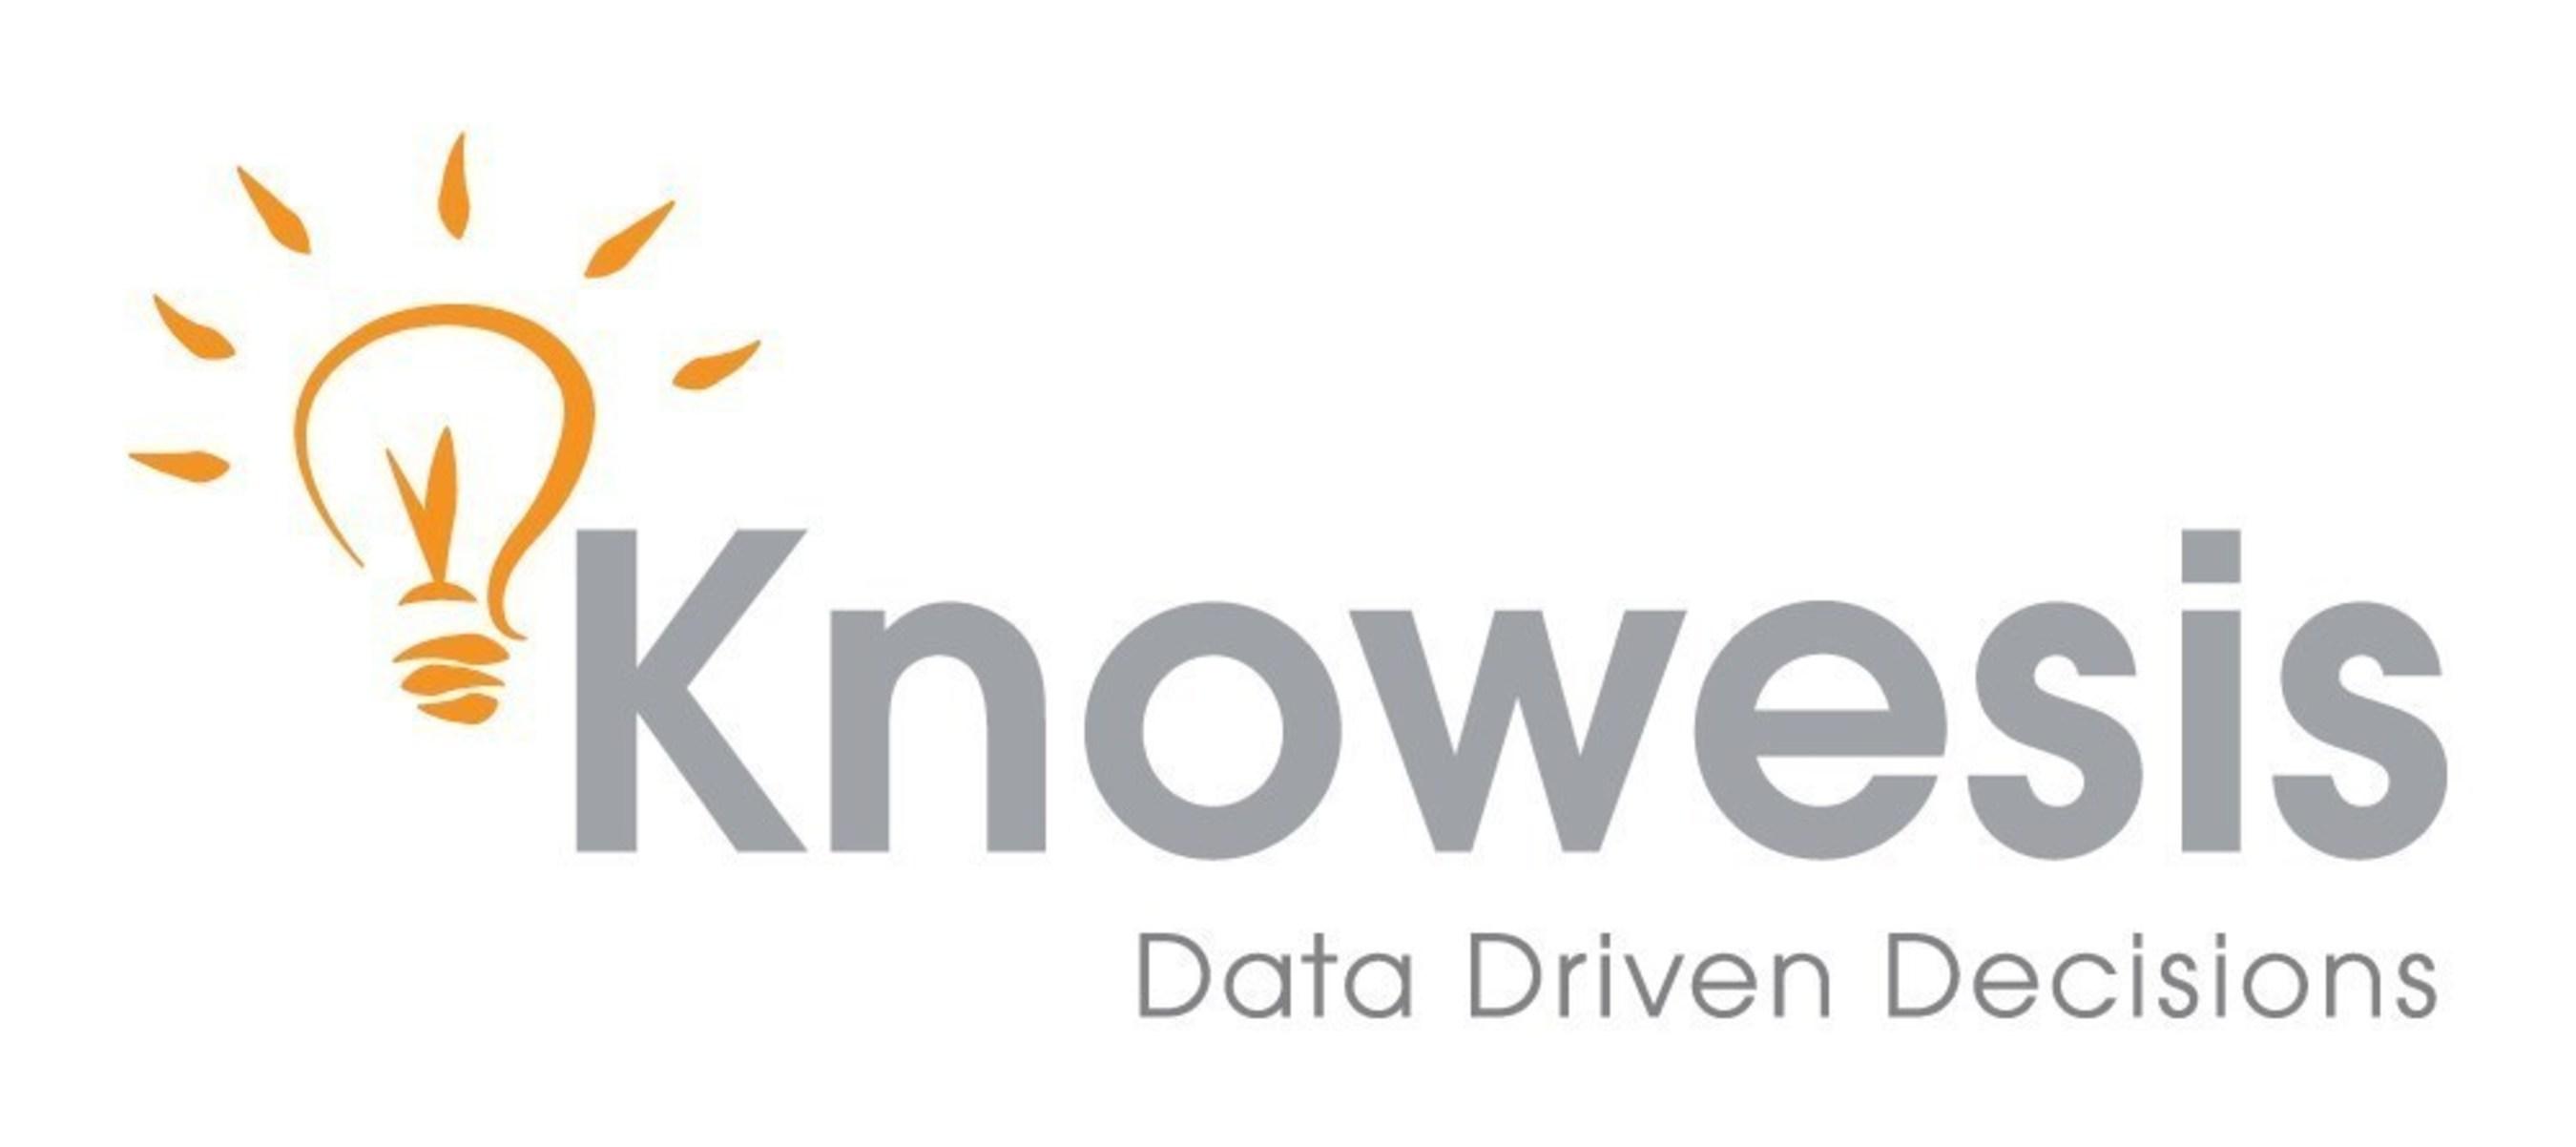 Knowesis Inc. - Data Driven Decisions (PRNewsFoto/Knowesis, Inc.)